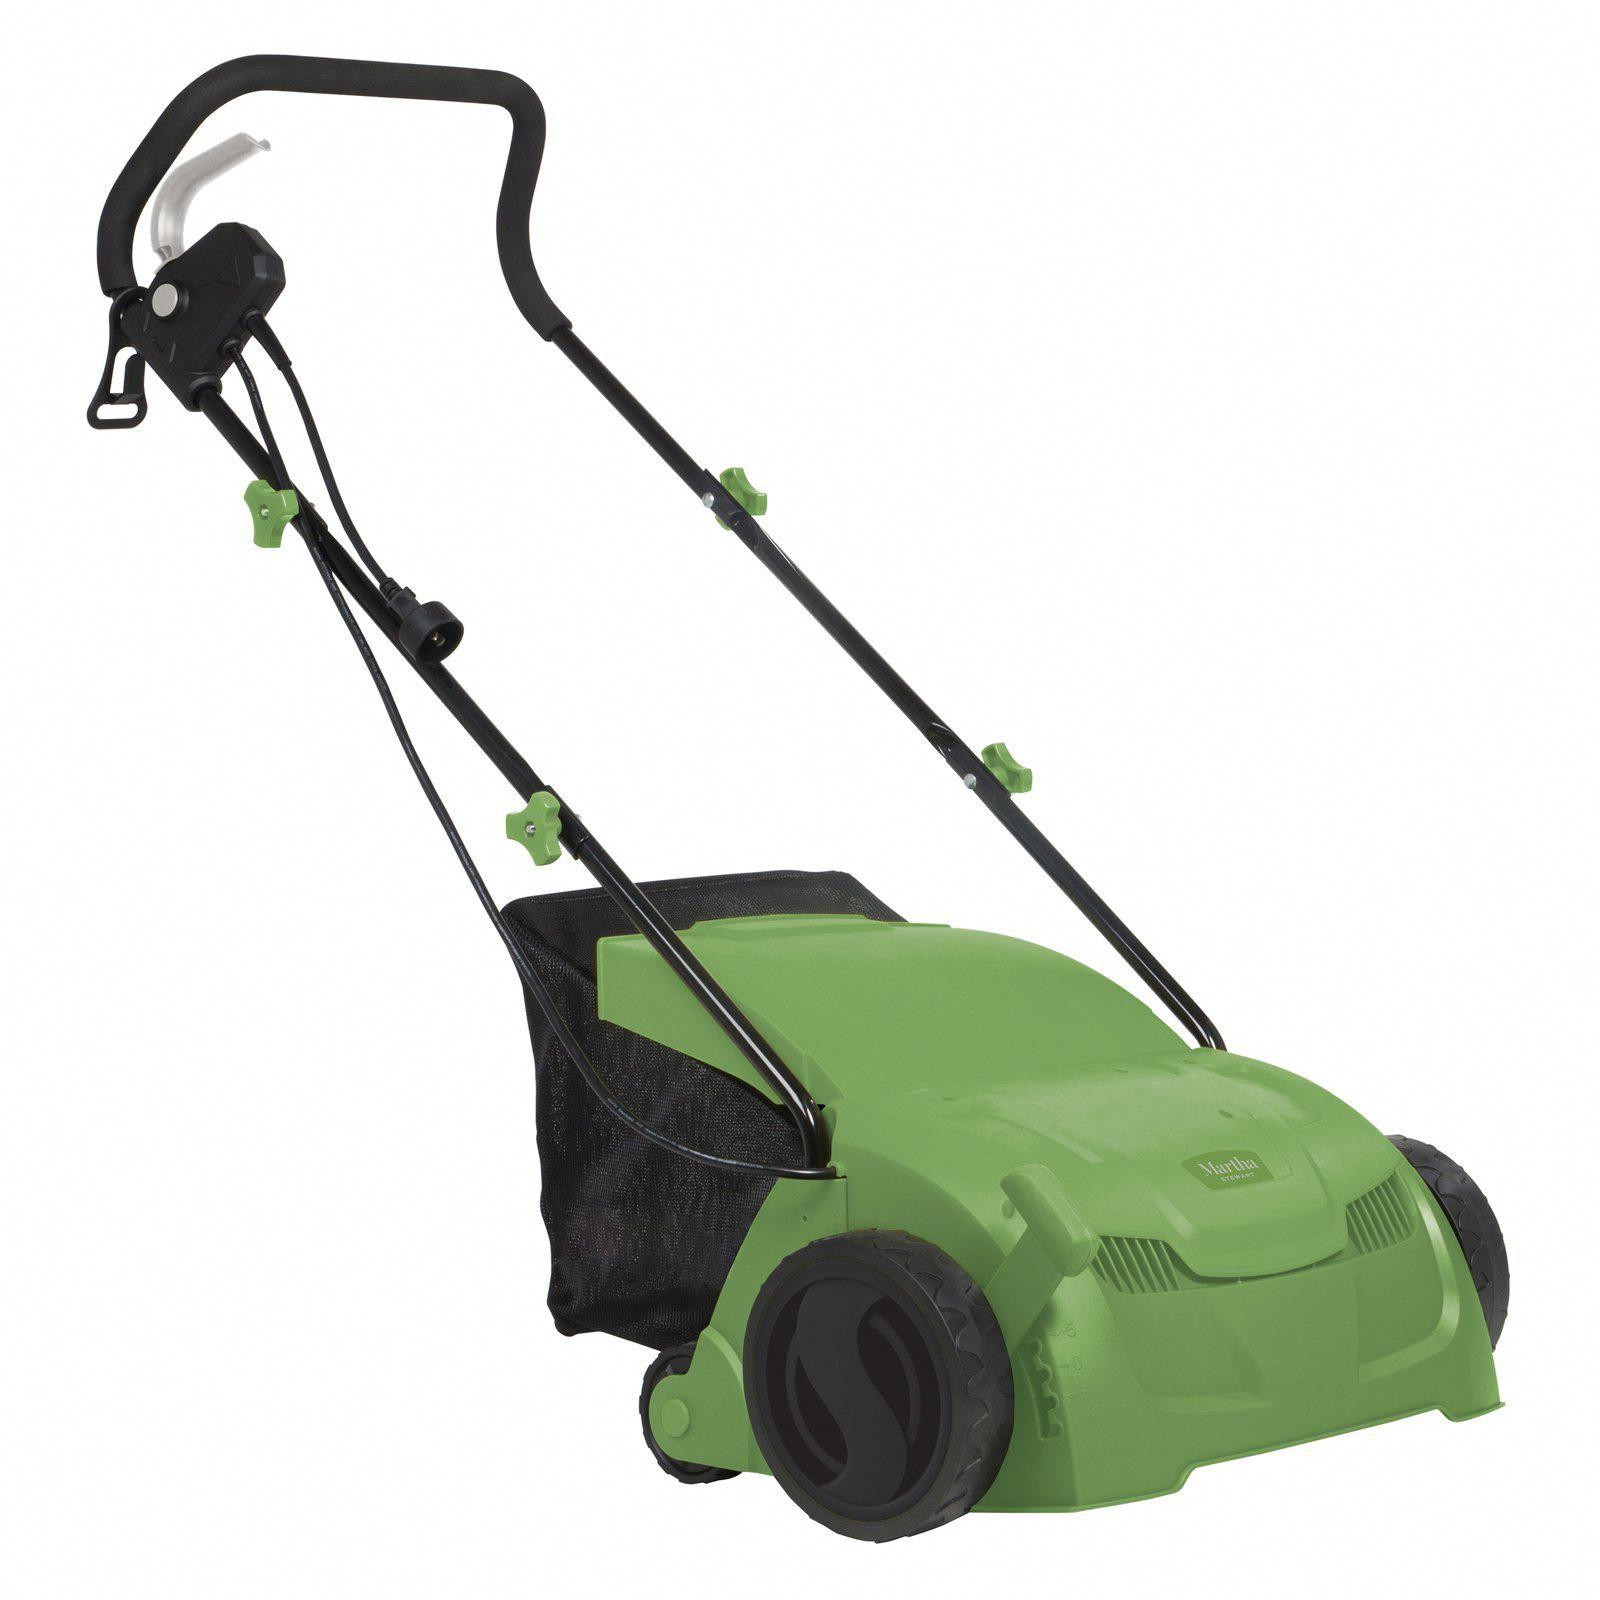 Martha Stewart 12 Amp 13 In Electric Scarifier And Lawn Dethatcher Bestgardentools Dethatching Lawn